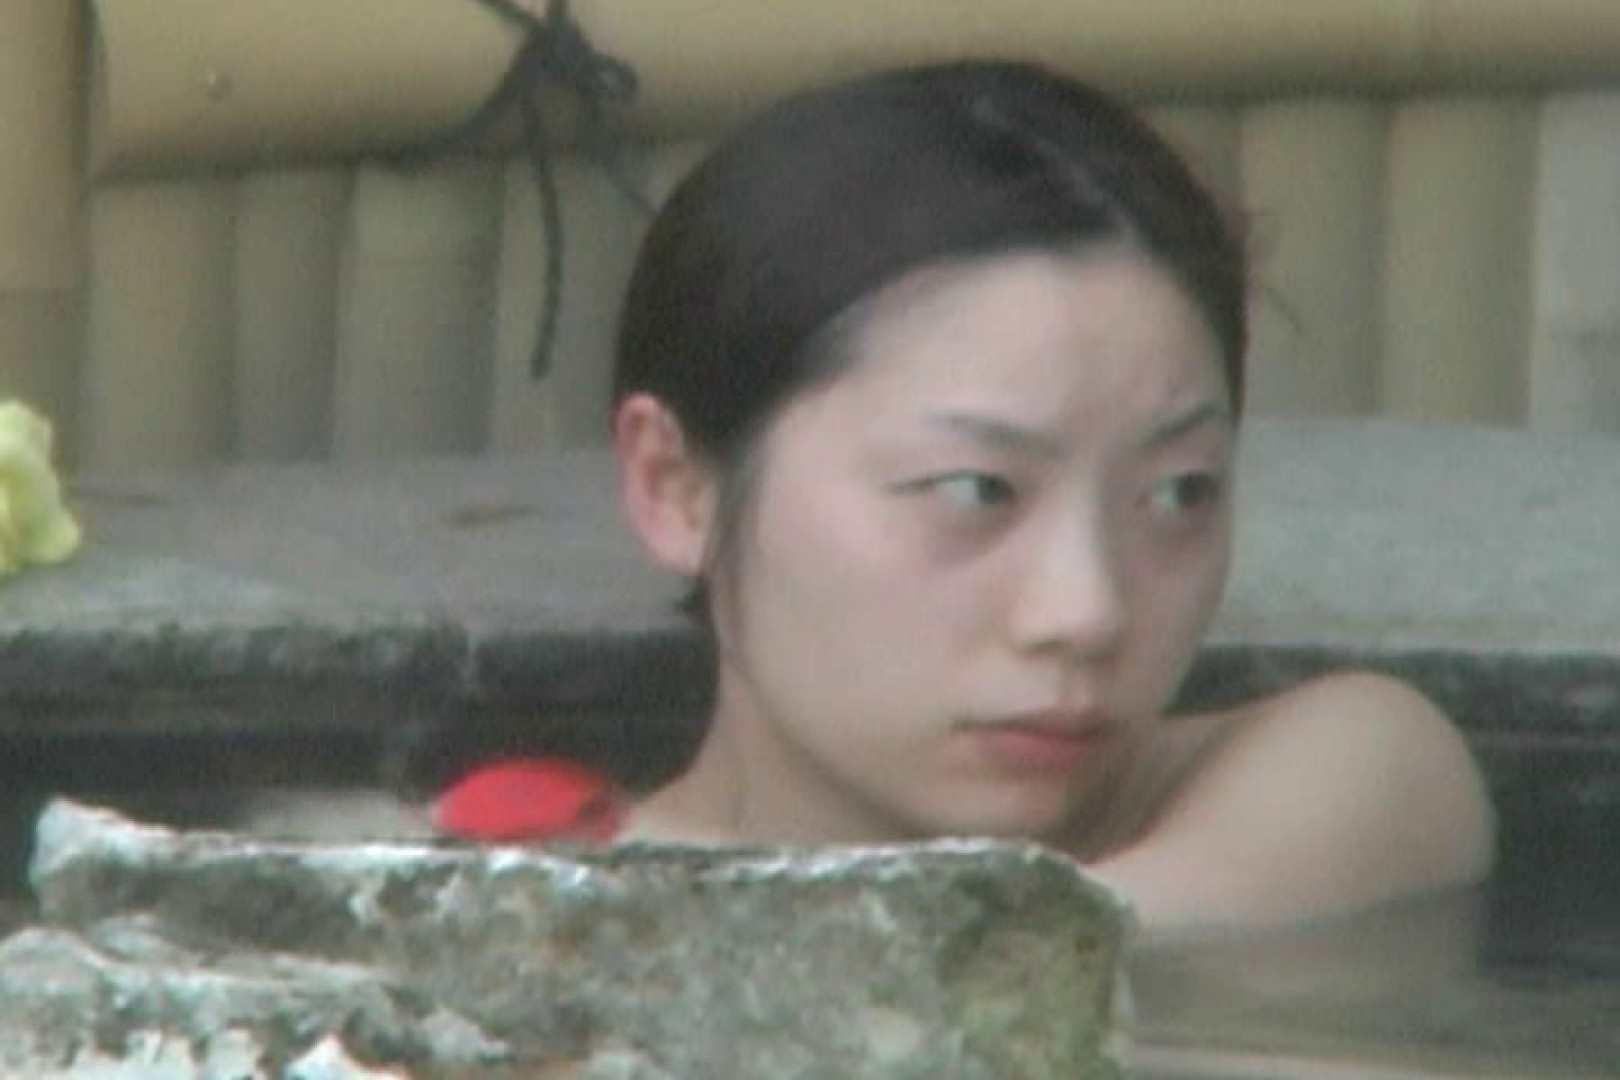 Aquaな露天風呂Vol.596 盗撮シリーズ | 露天風呂編  113PIX 11